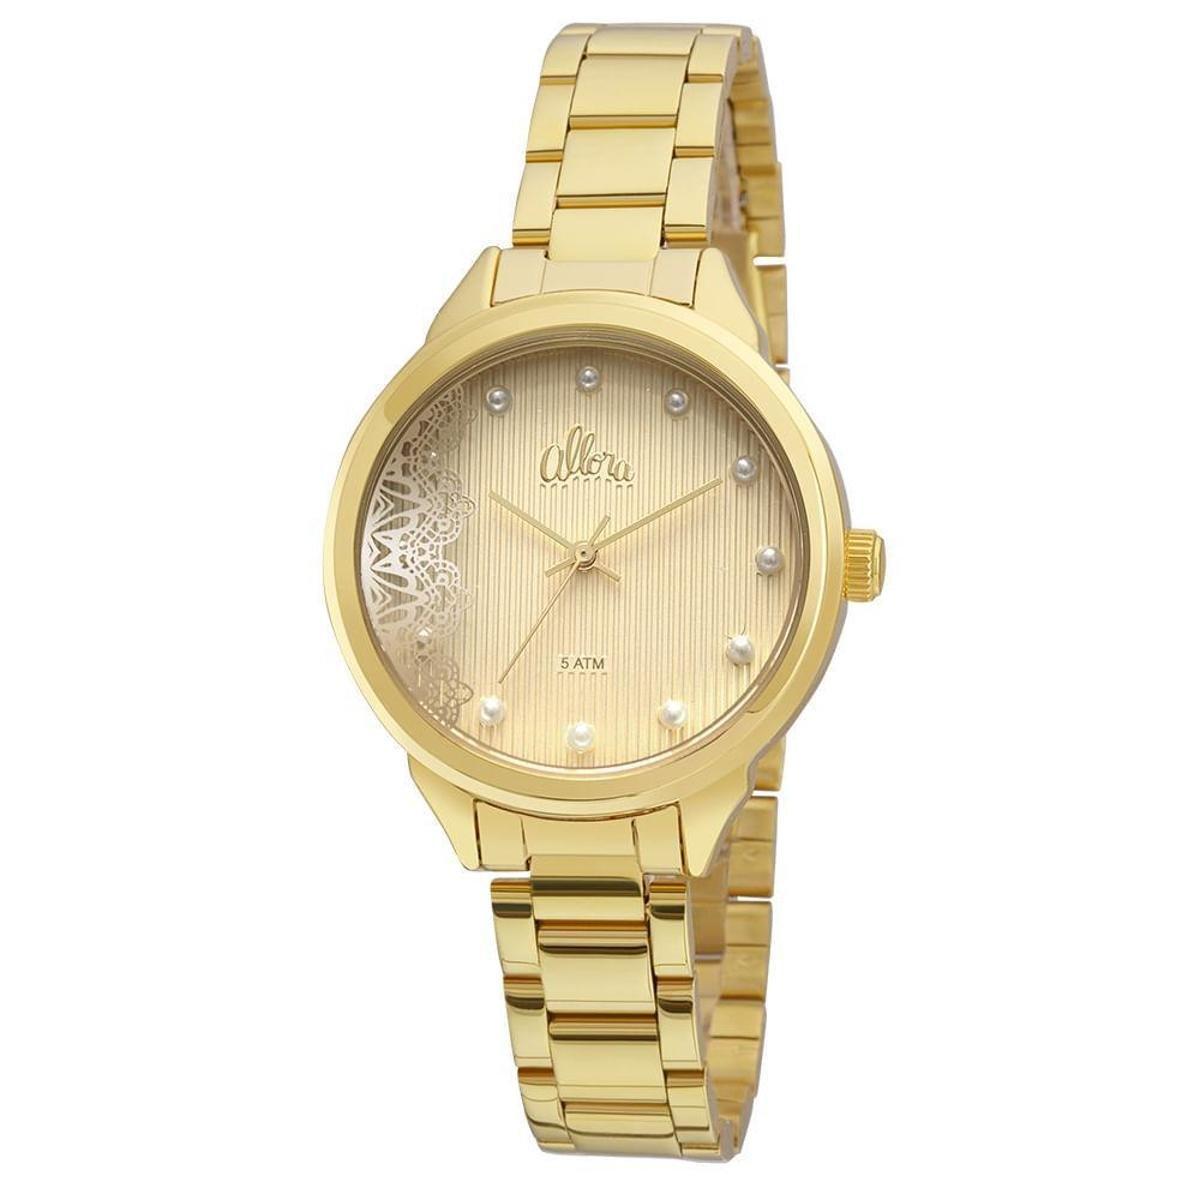 Kit Relógio Allora Feminino Listras e Rendas - Compre Agora   Netshoes 98dab30d9e